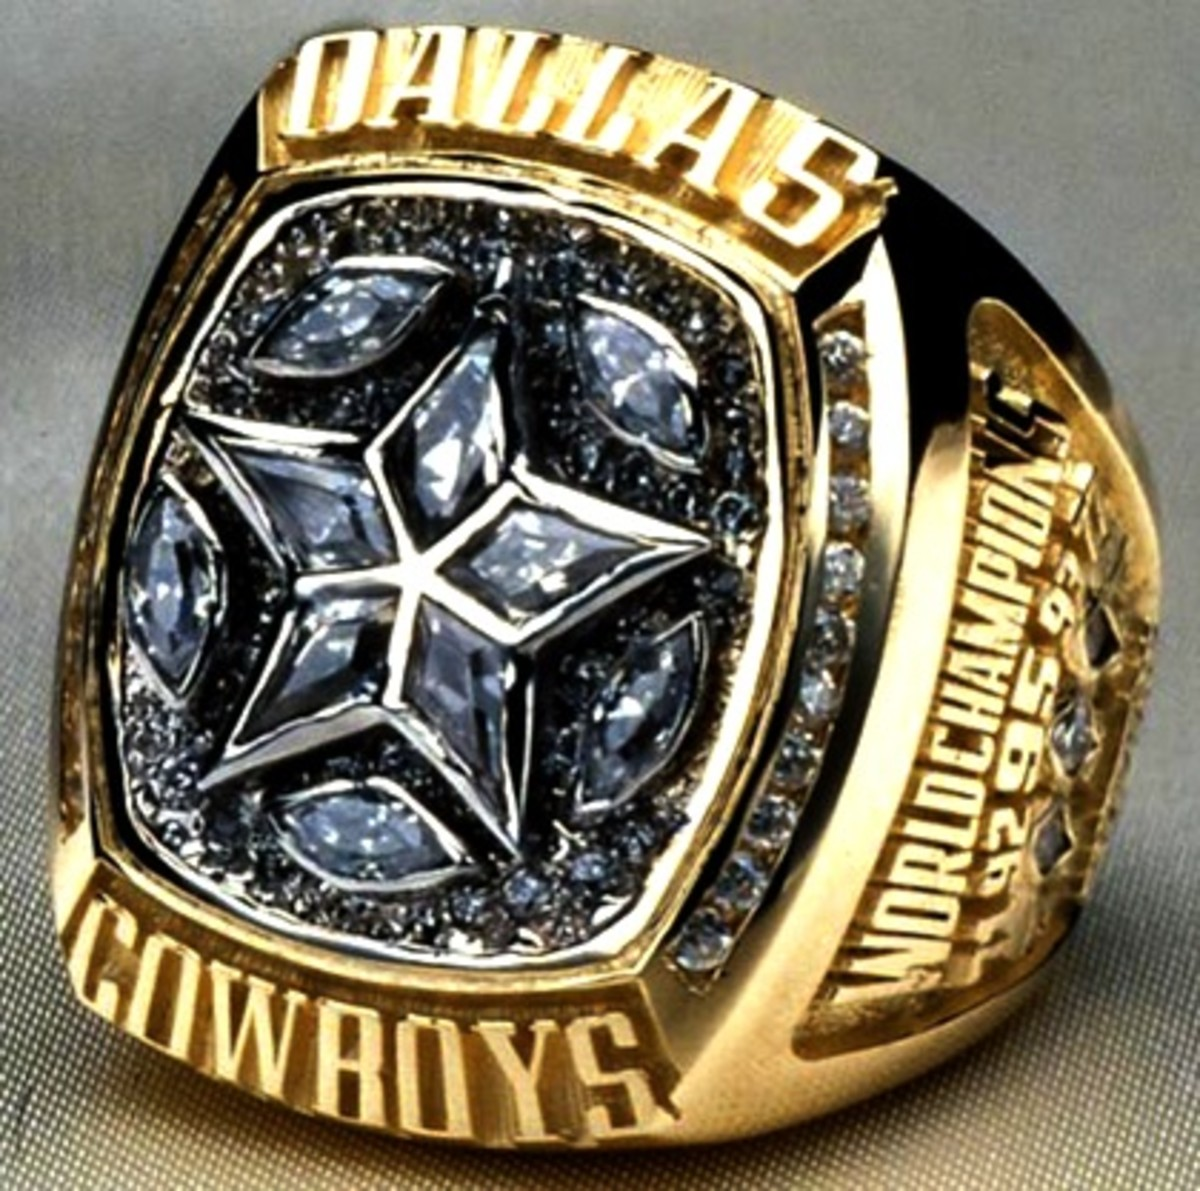 XXX Dallas cowboys 1996 super bowl championship ring